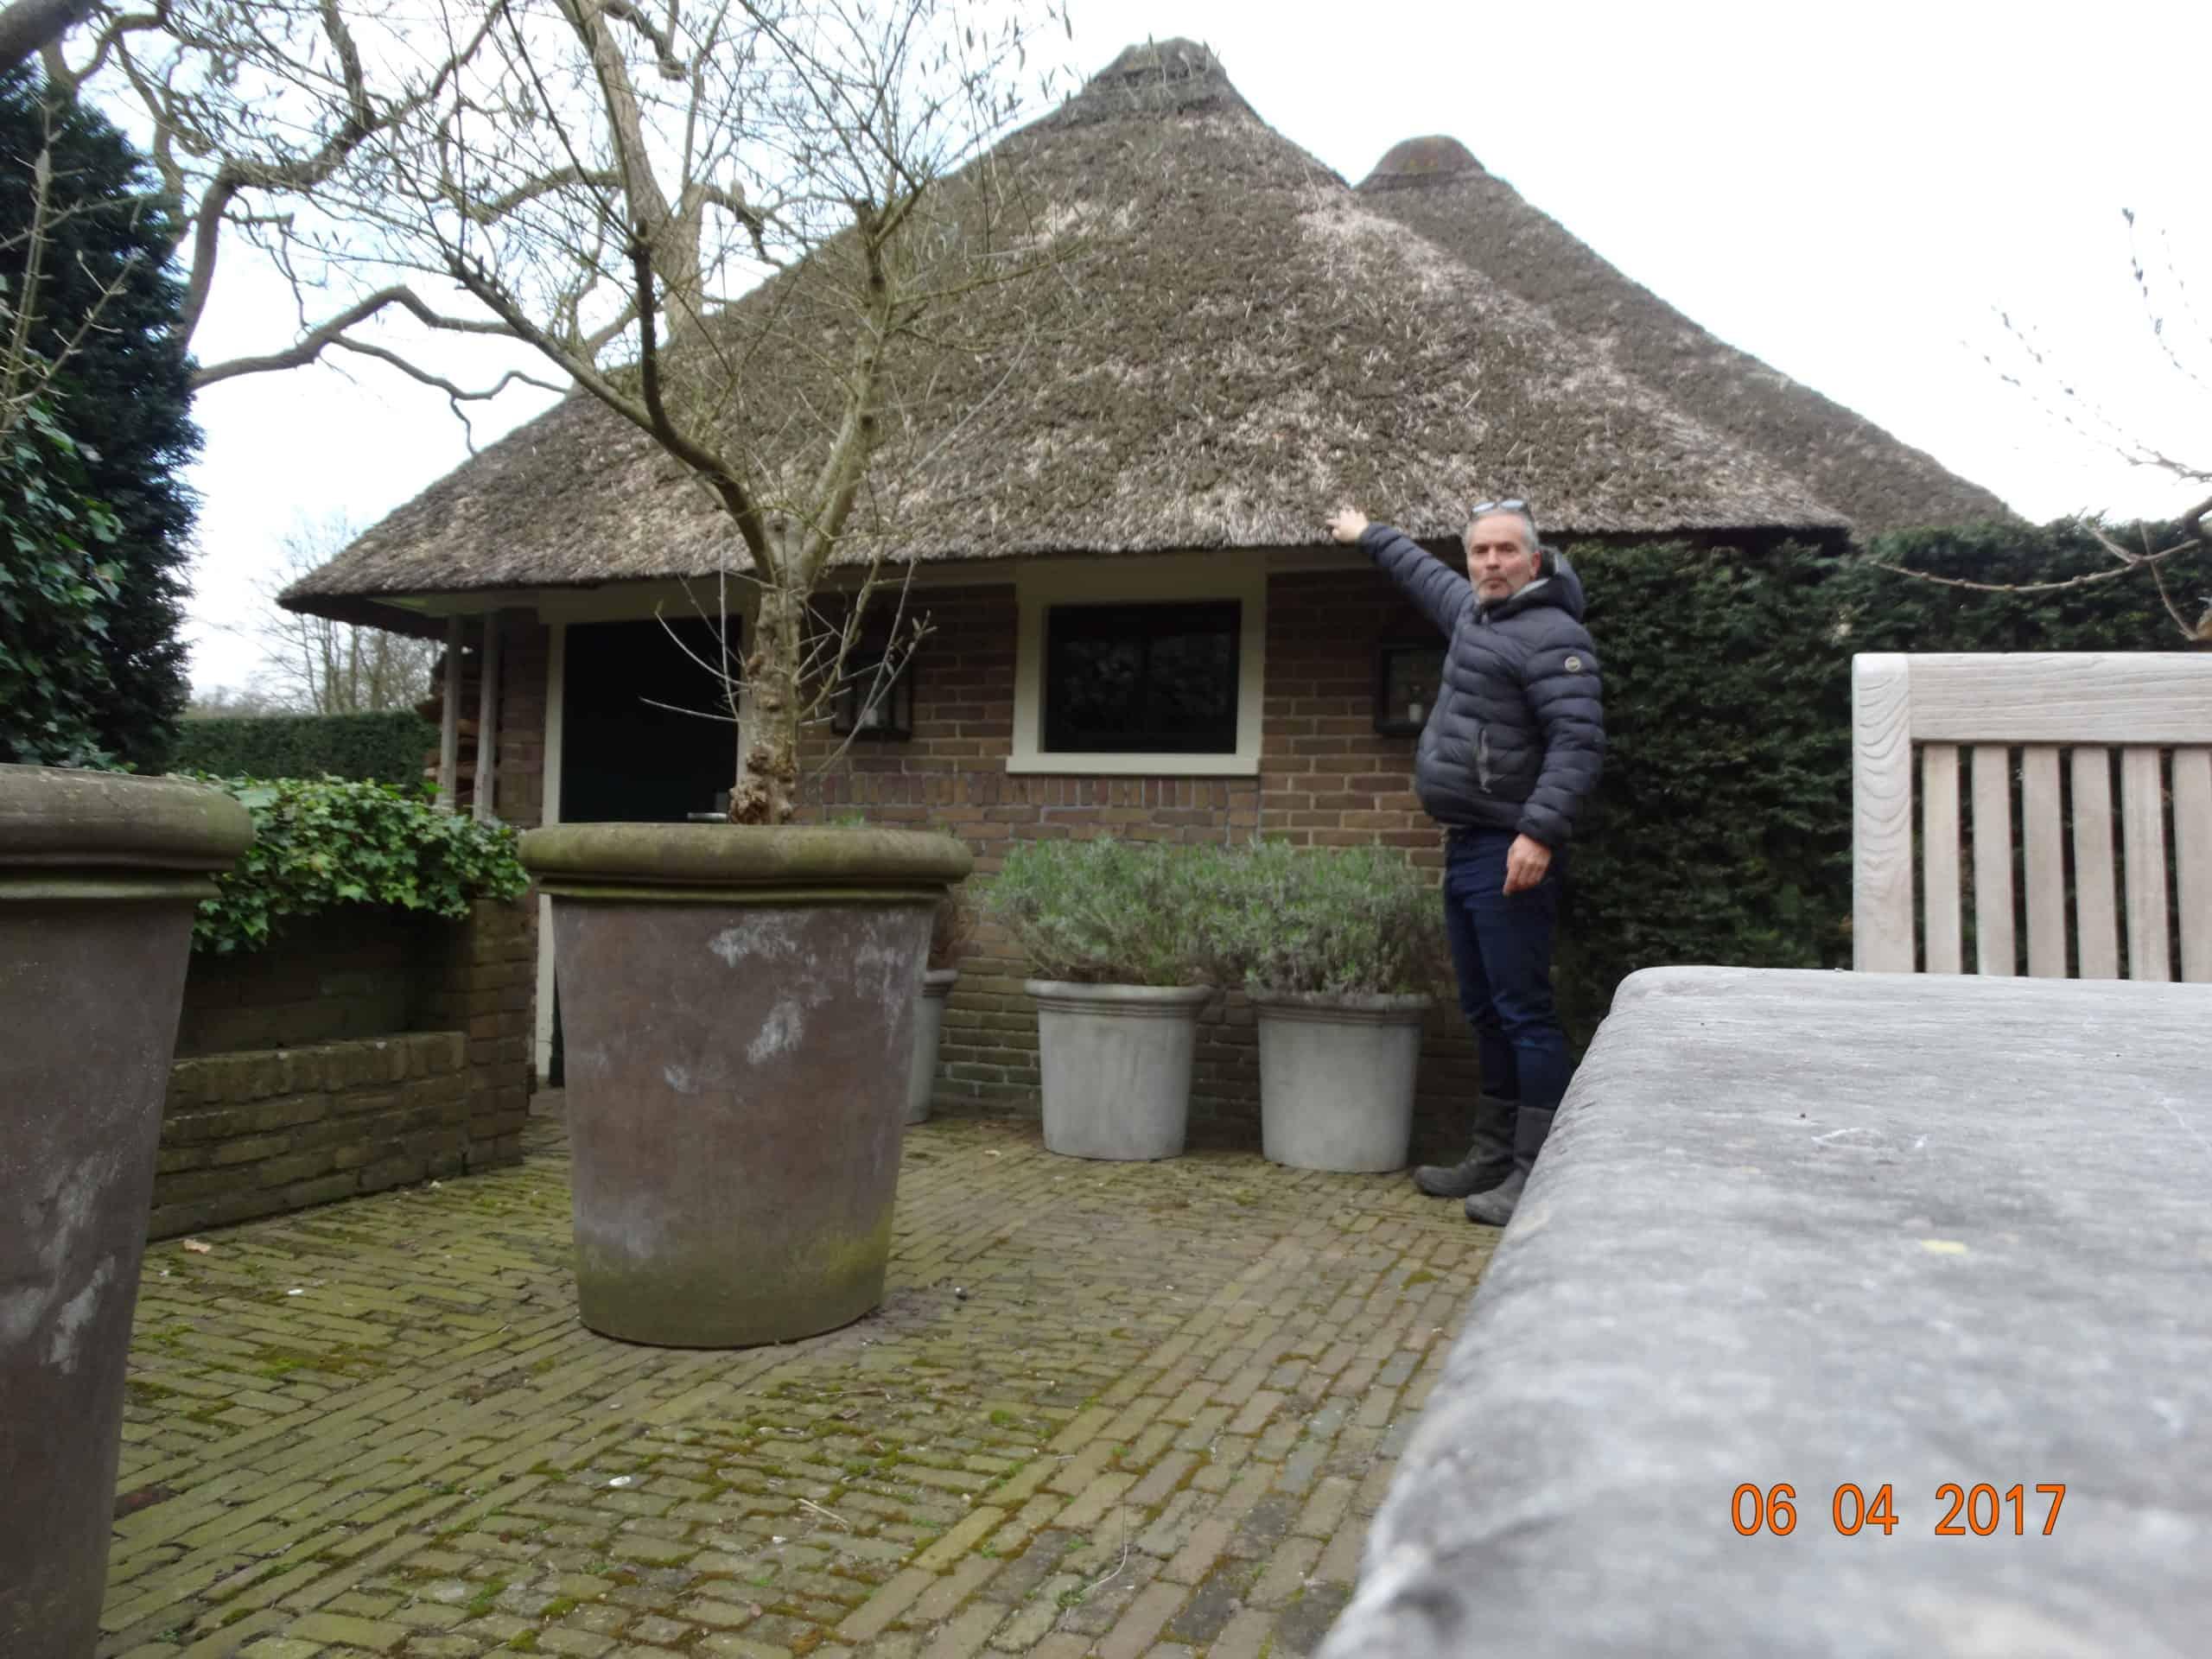 Bouwkundige keuring Hilversum (8)